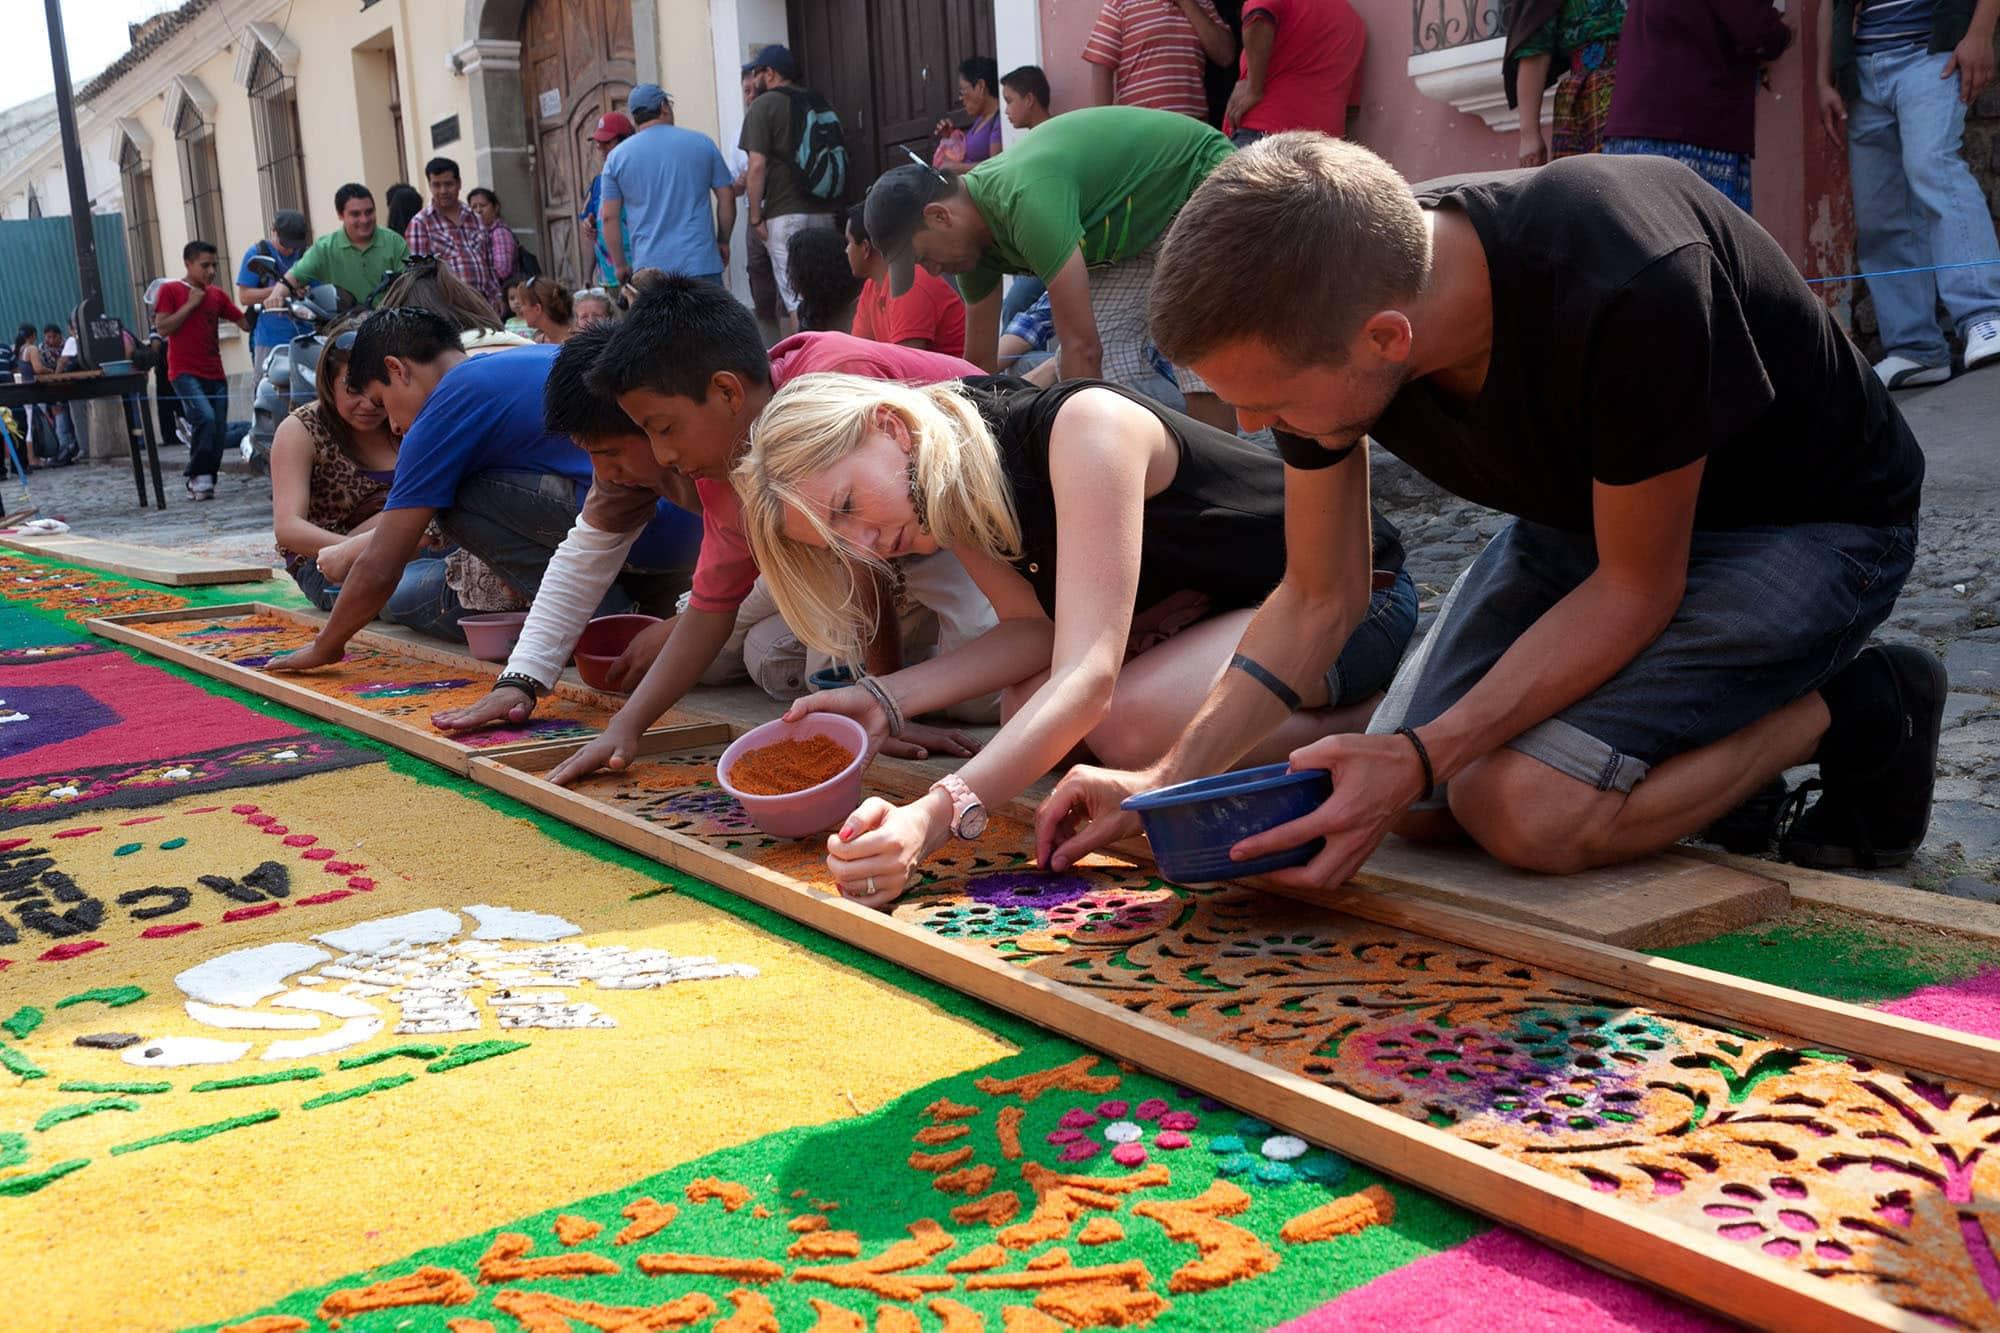 La alfombra • Choosing Figs